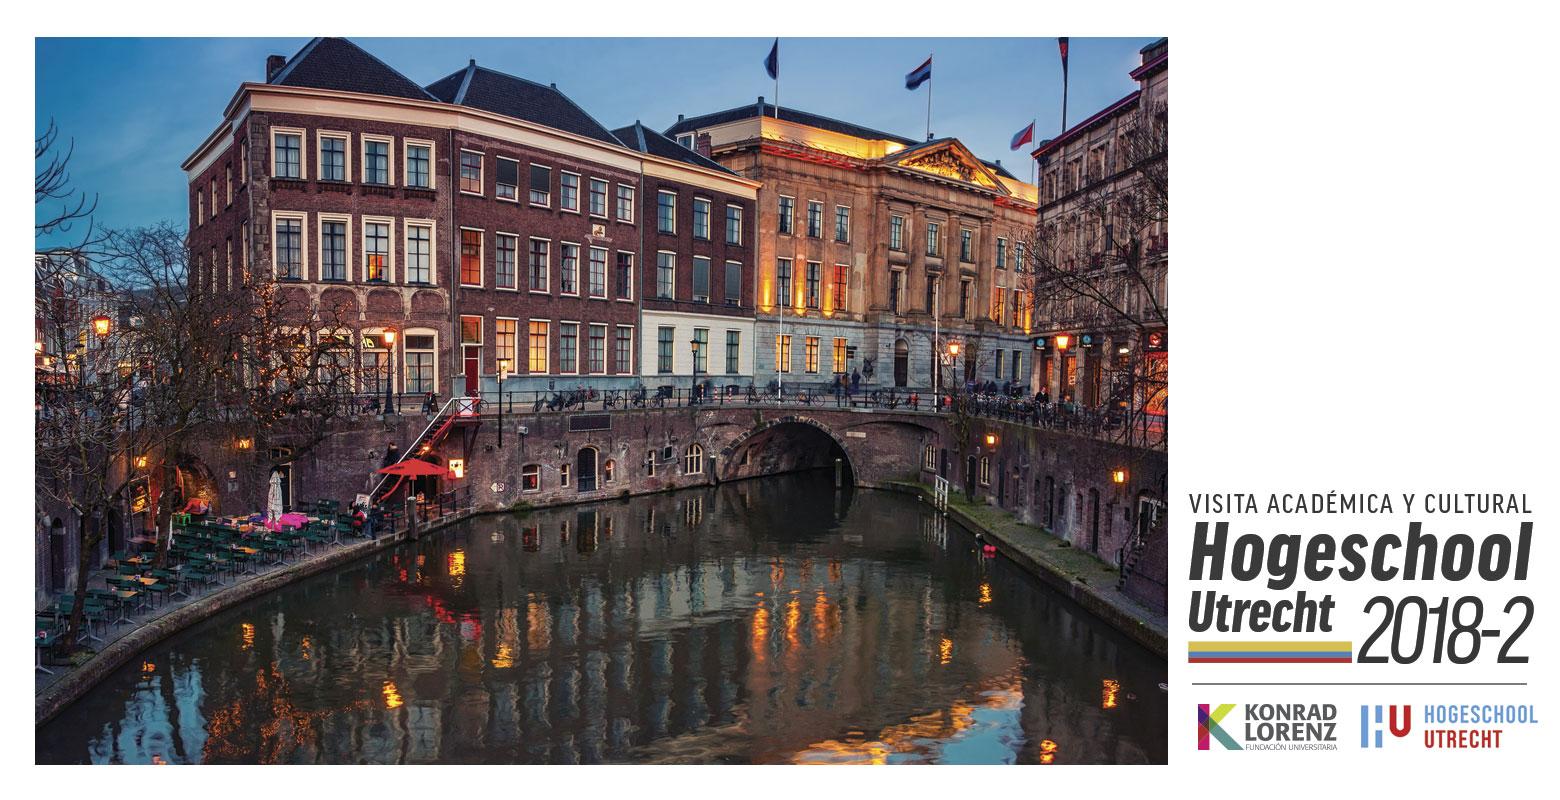 Visita Académica y Cultural Hogeschool Utrecht 2018-2